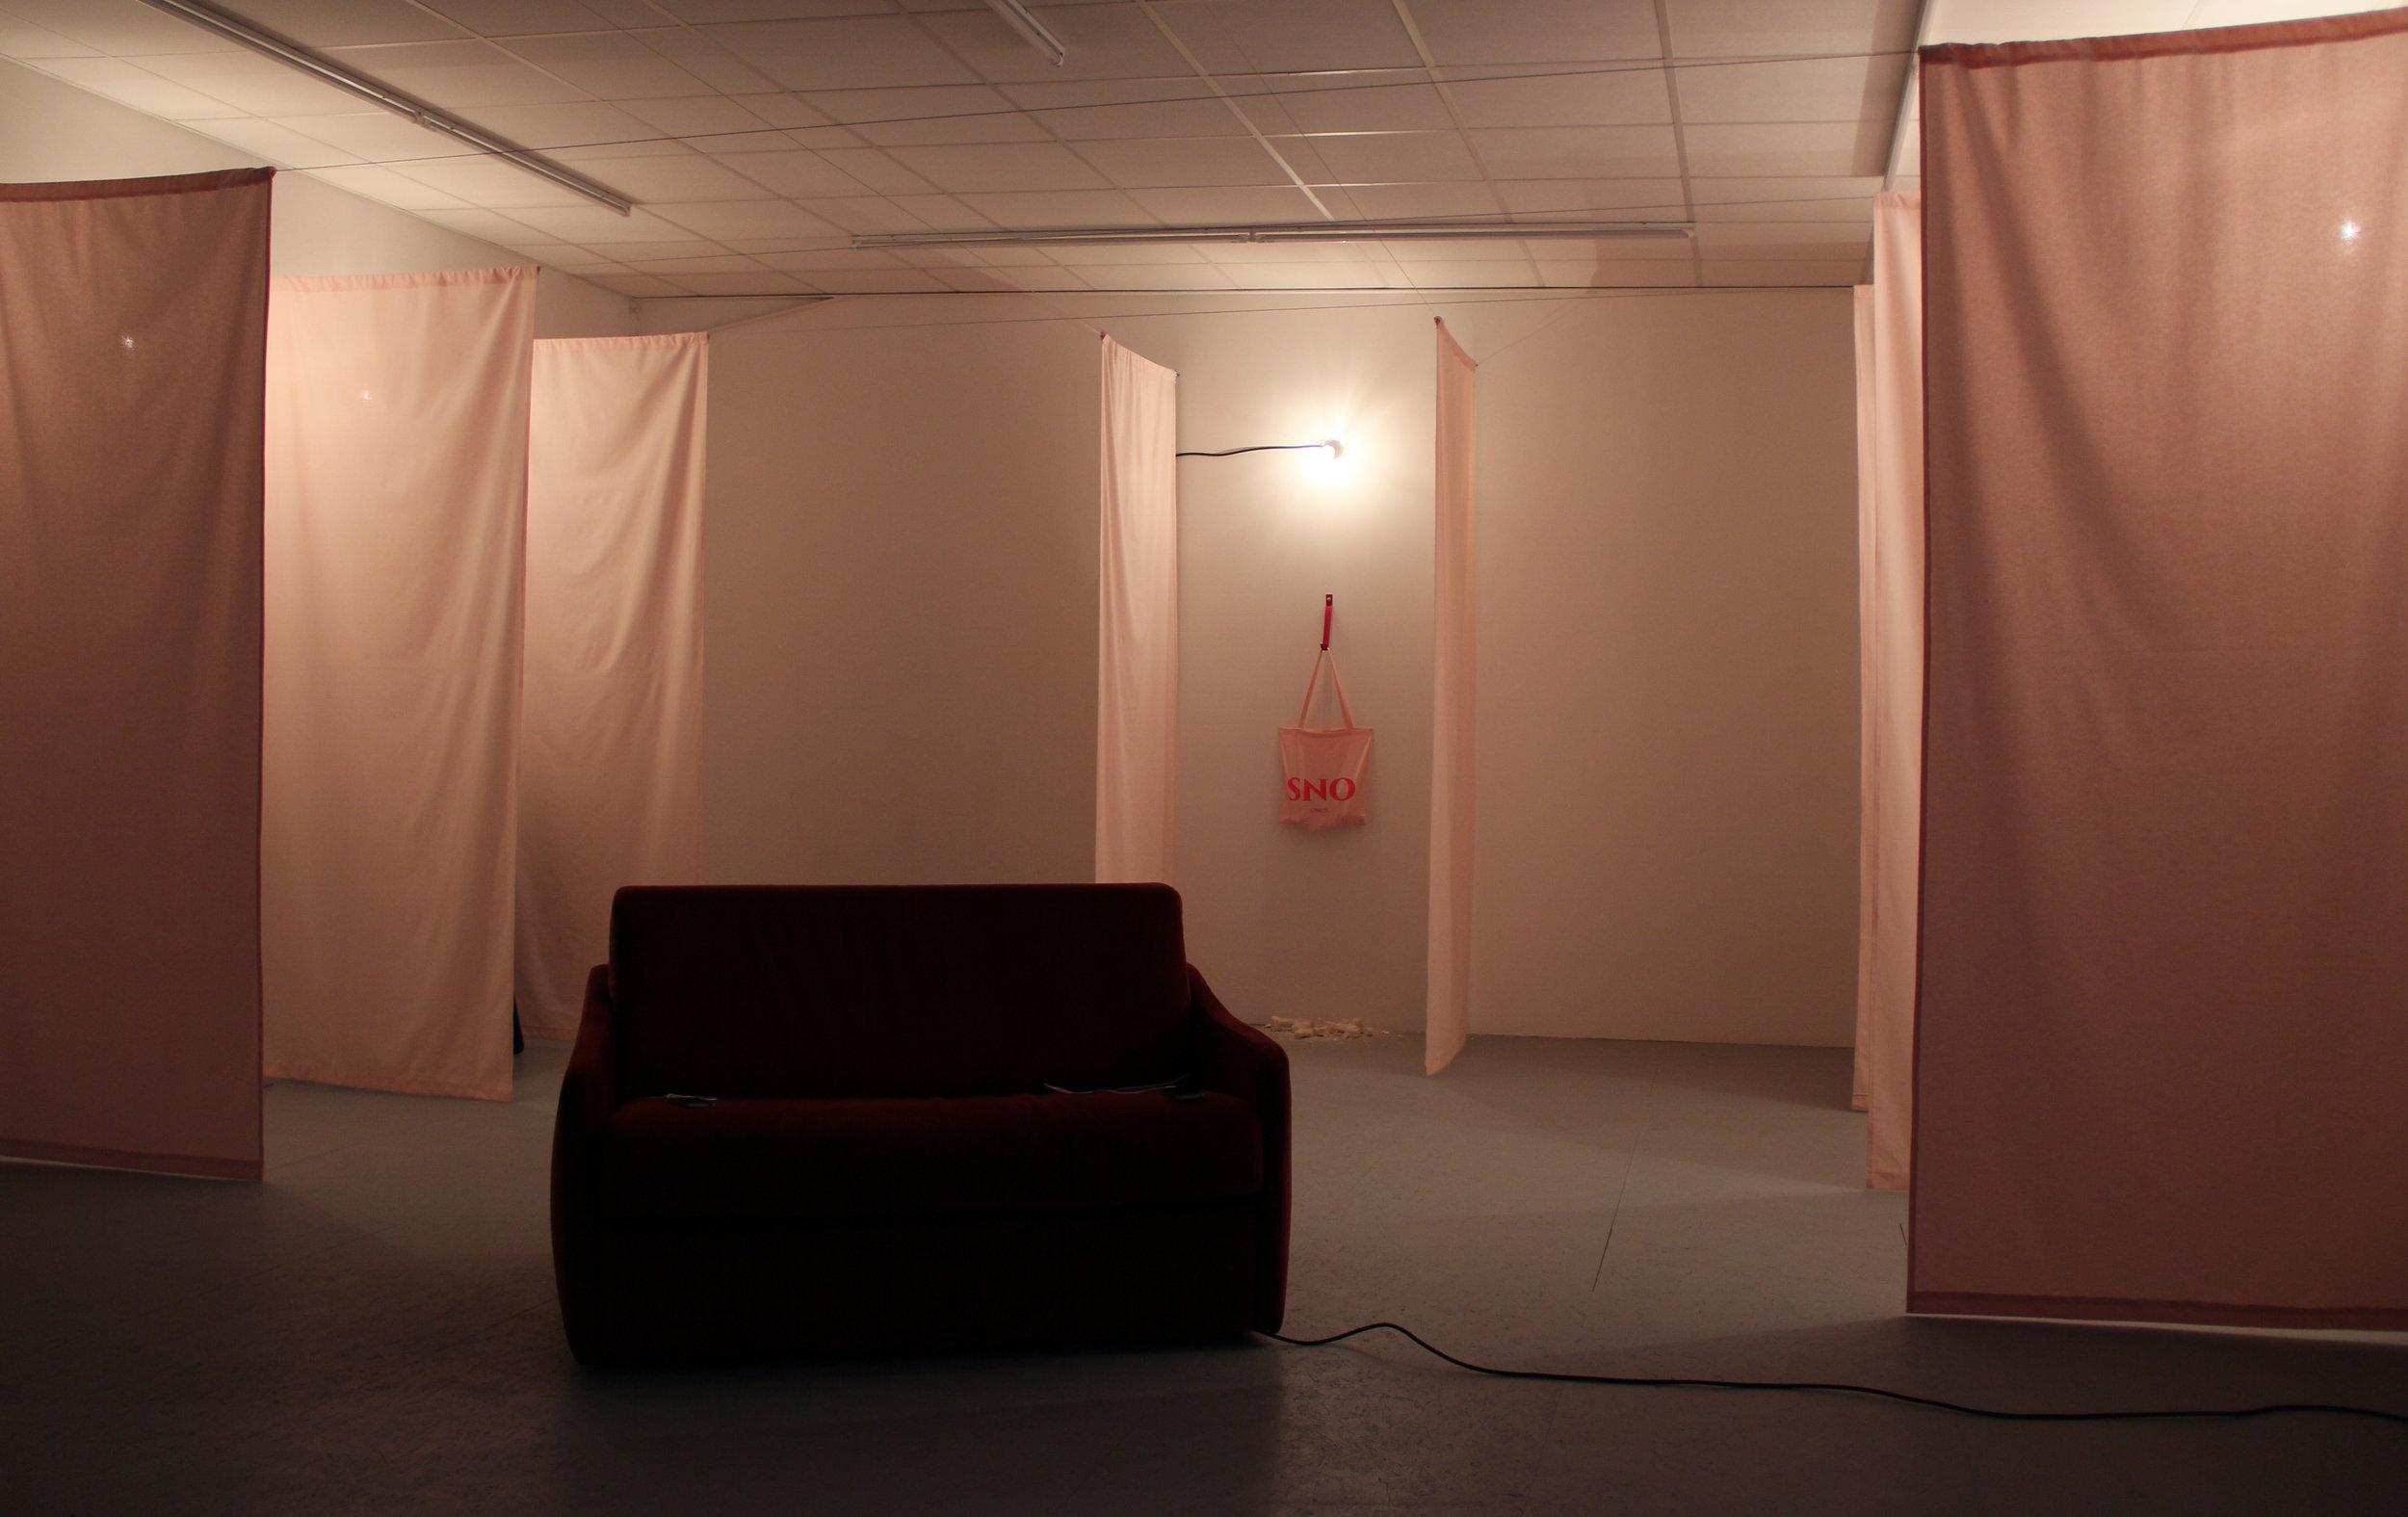 Installation view of Pauline Gompertz's solo exhibition at Galerie Marchepied